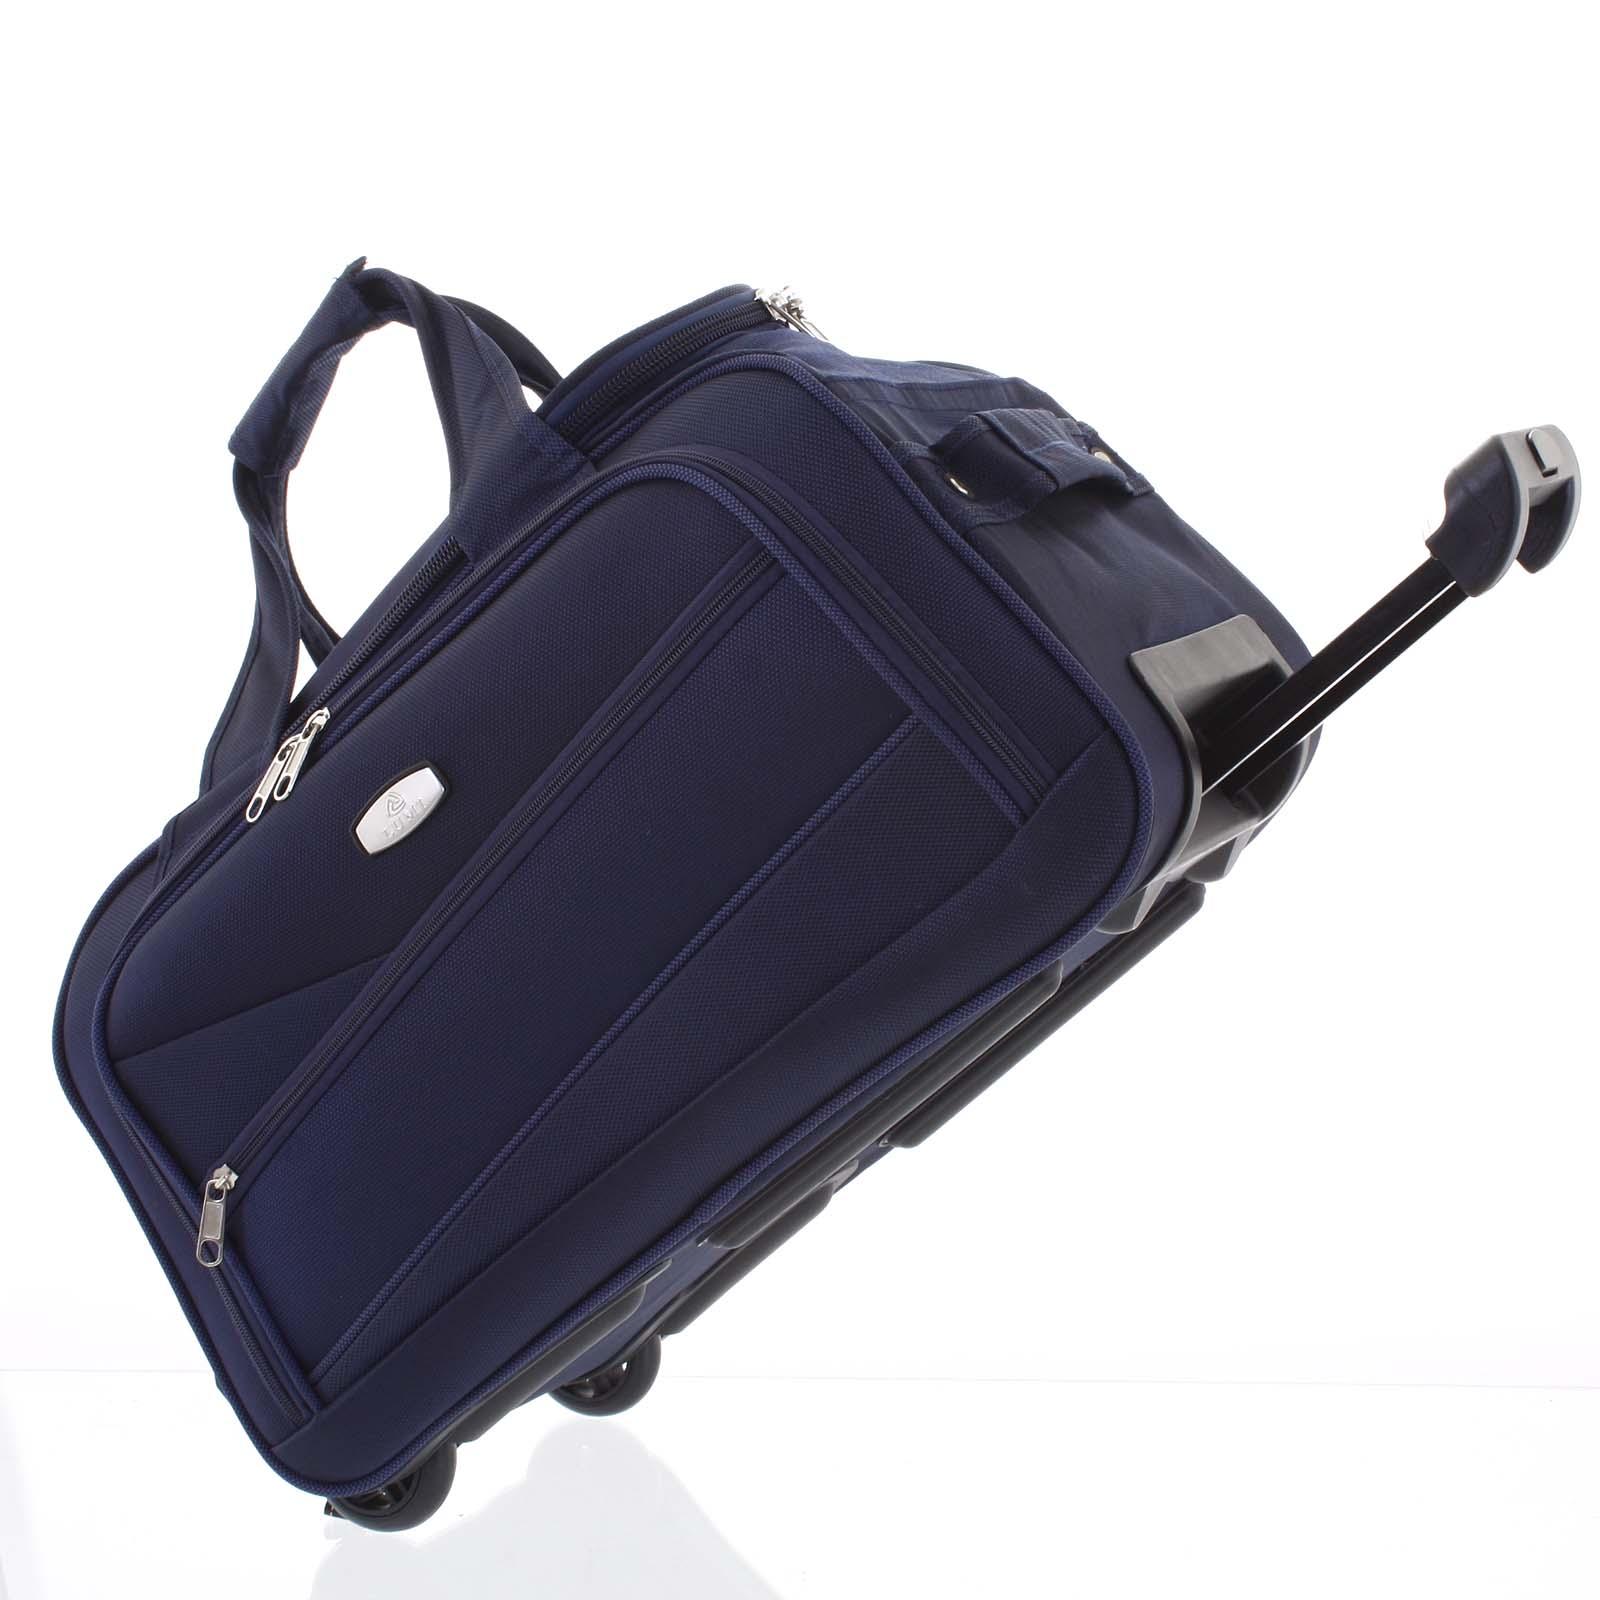 Tmavomodrá cestovná taška na kolieskach - Lumi Sakk M modrá